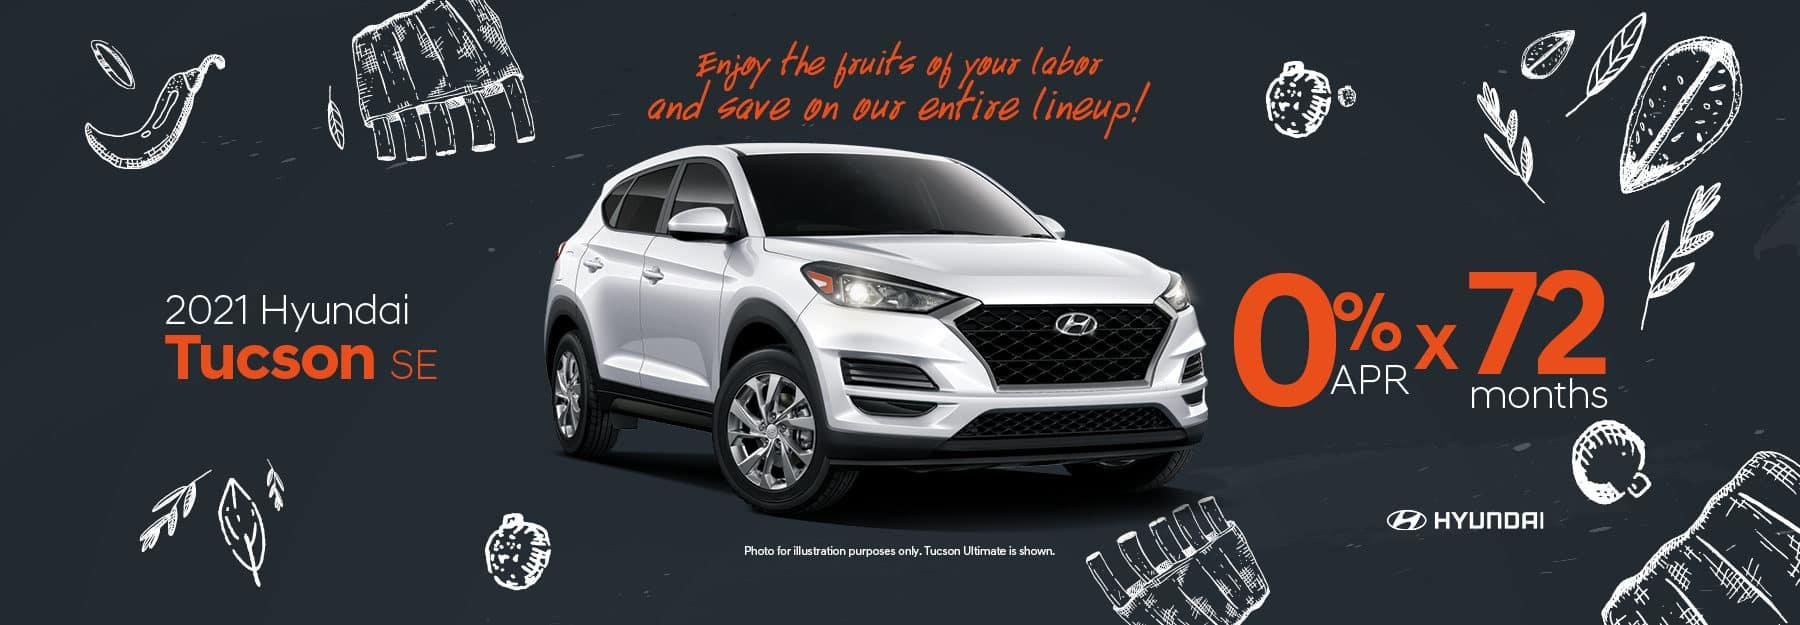 0% APR for 72 months on 2021 Hyundai Tucson SE